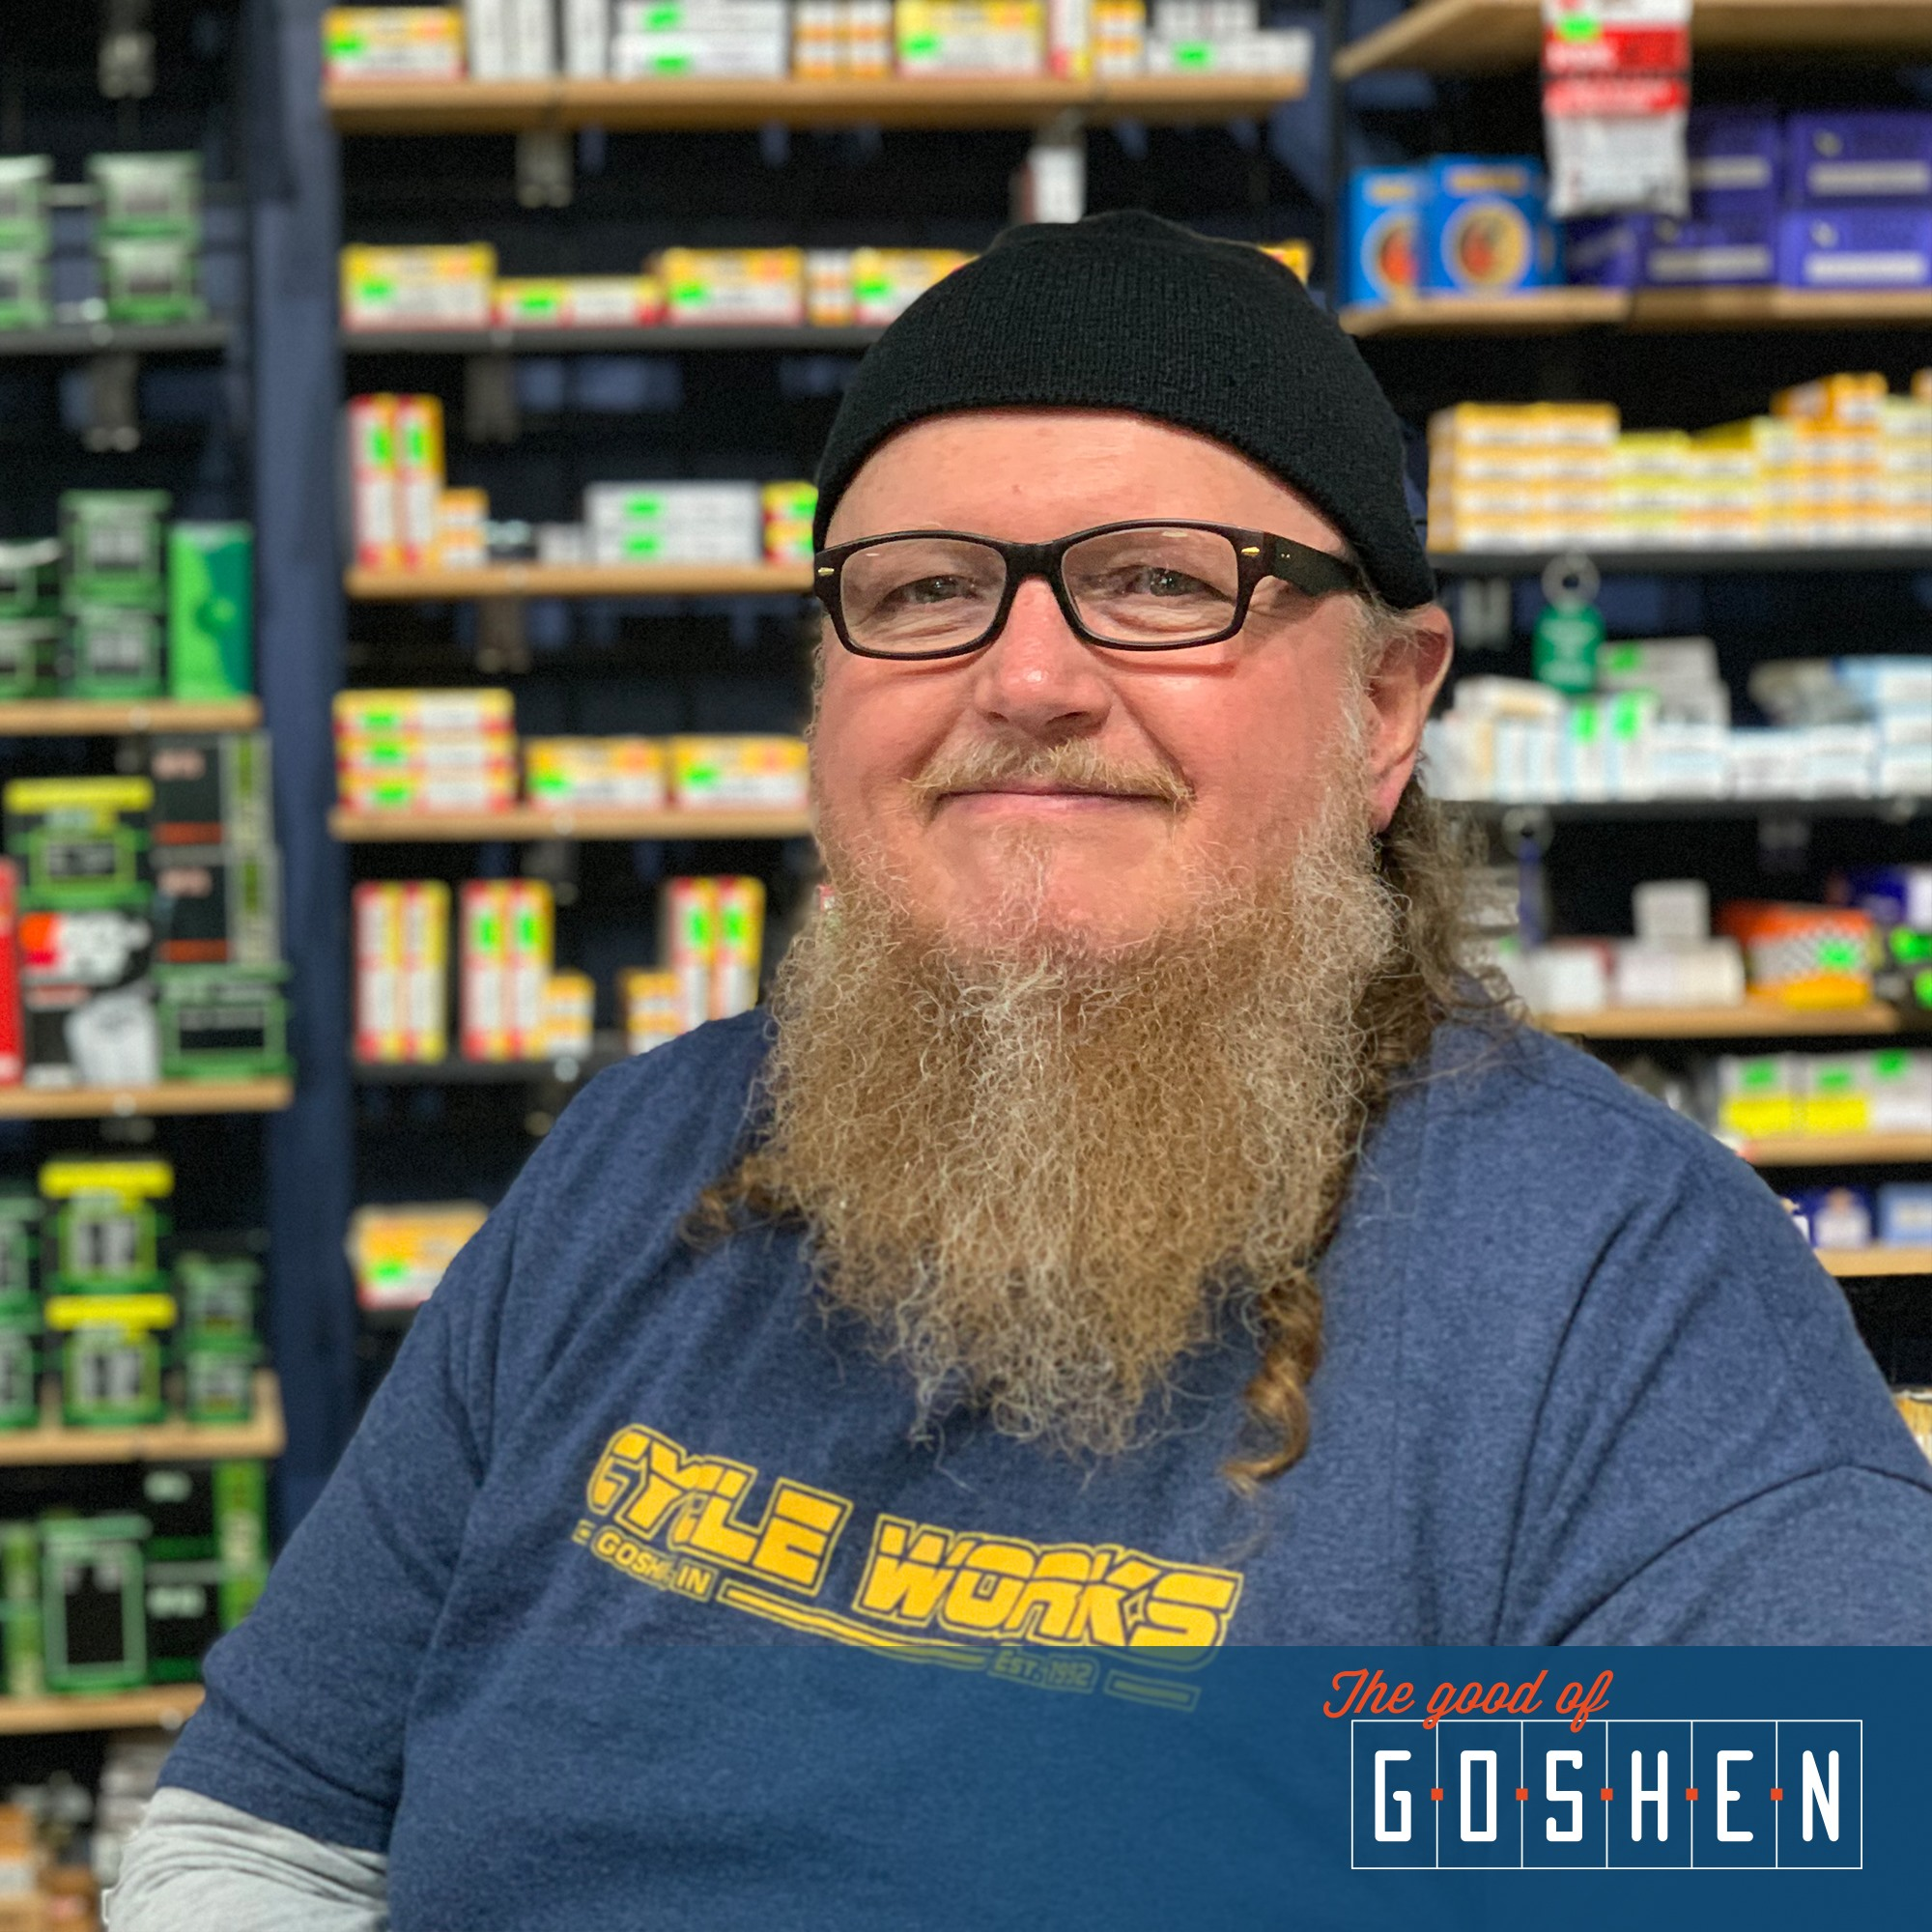 Matt Schrock • The Good of Goshen